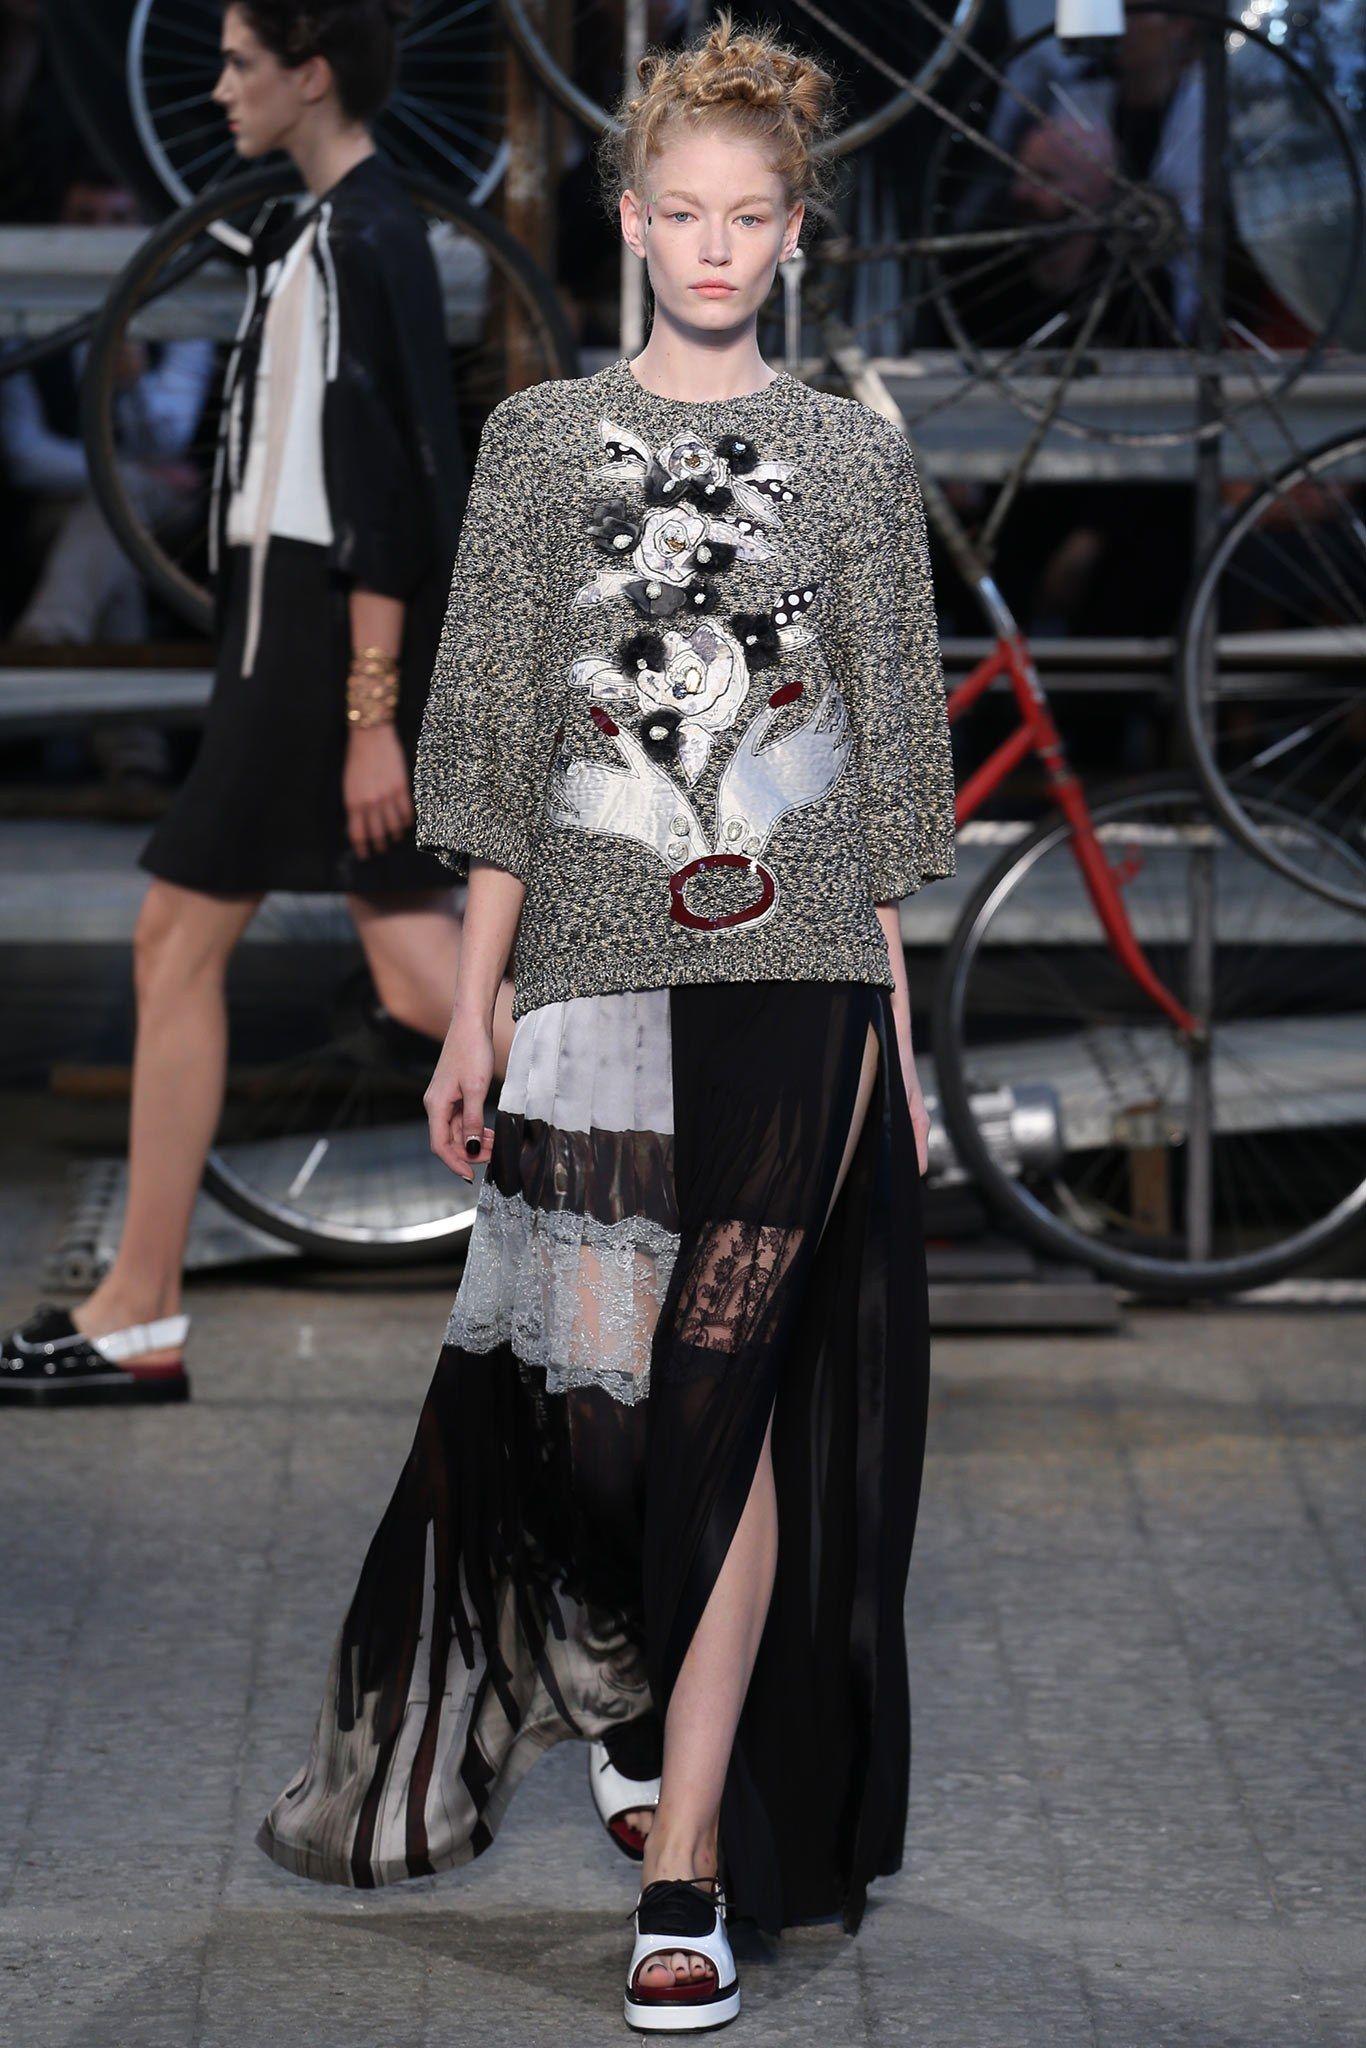 Antonio Marras Spring 2015 Ready-to-Wear Fashion Show